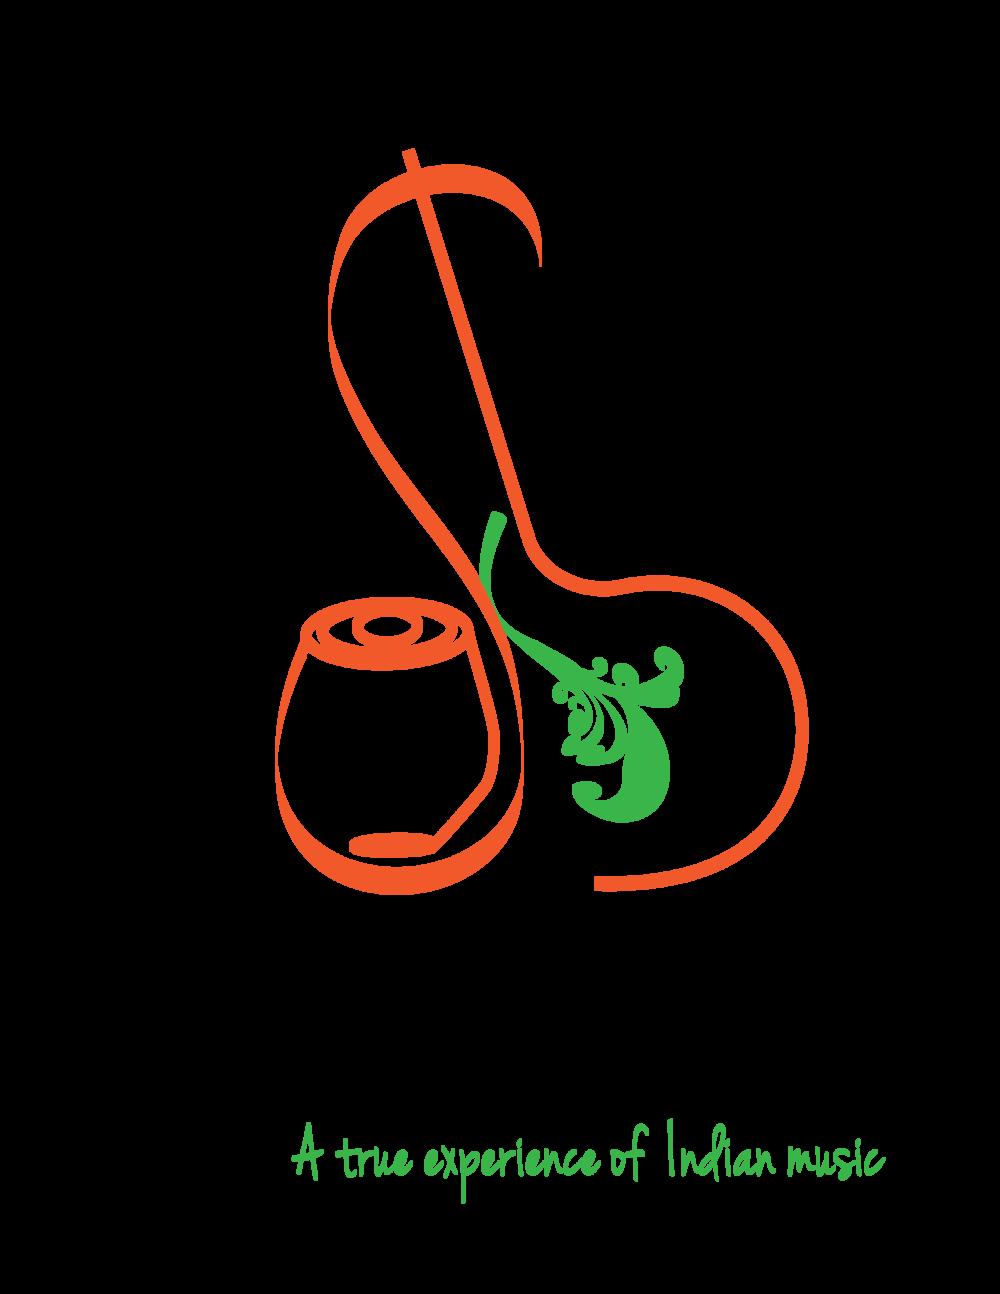 chhandayan updated logos (usa)_Artboard 2.png